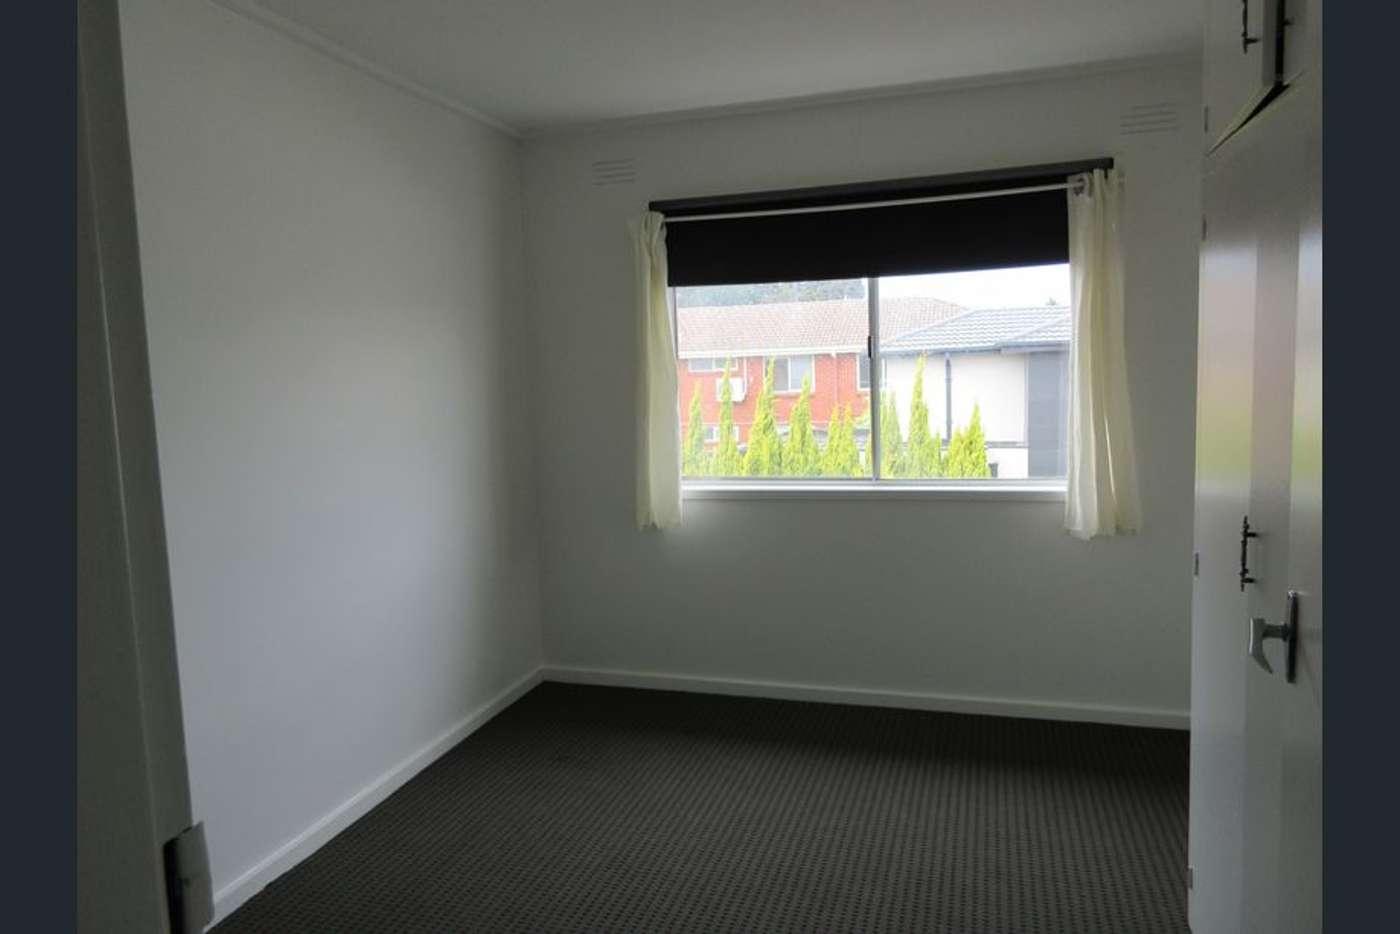 Seventh view of Homely apartment listing, 8/62 Dundas Street, Thornbury VIC 3071